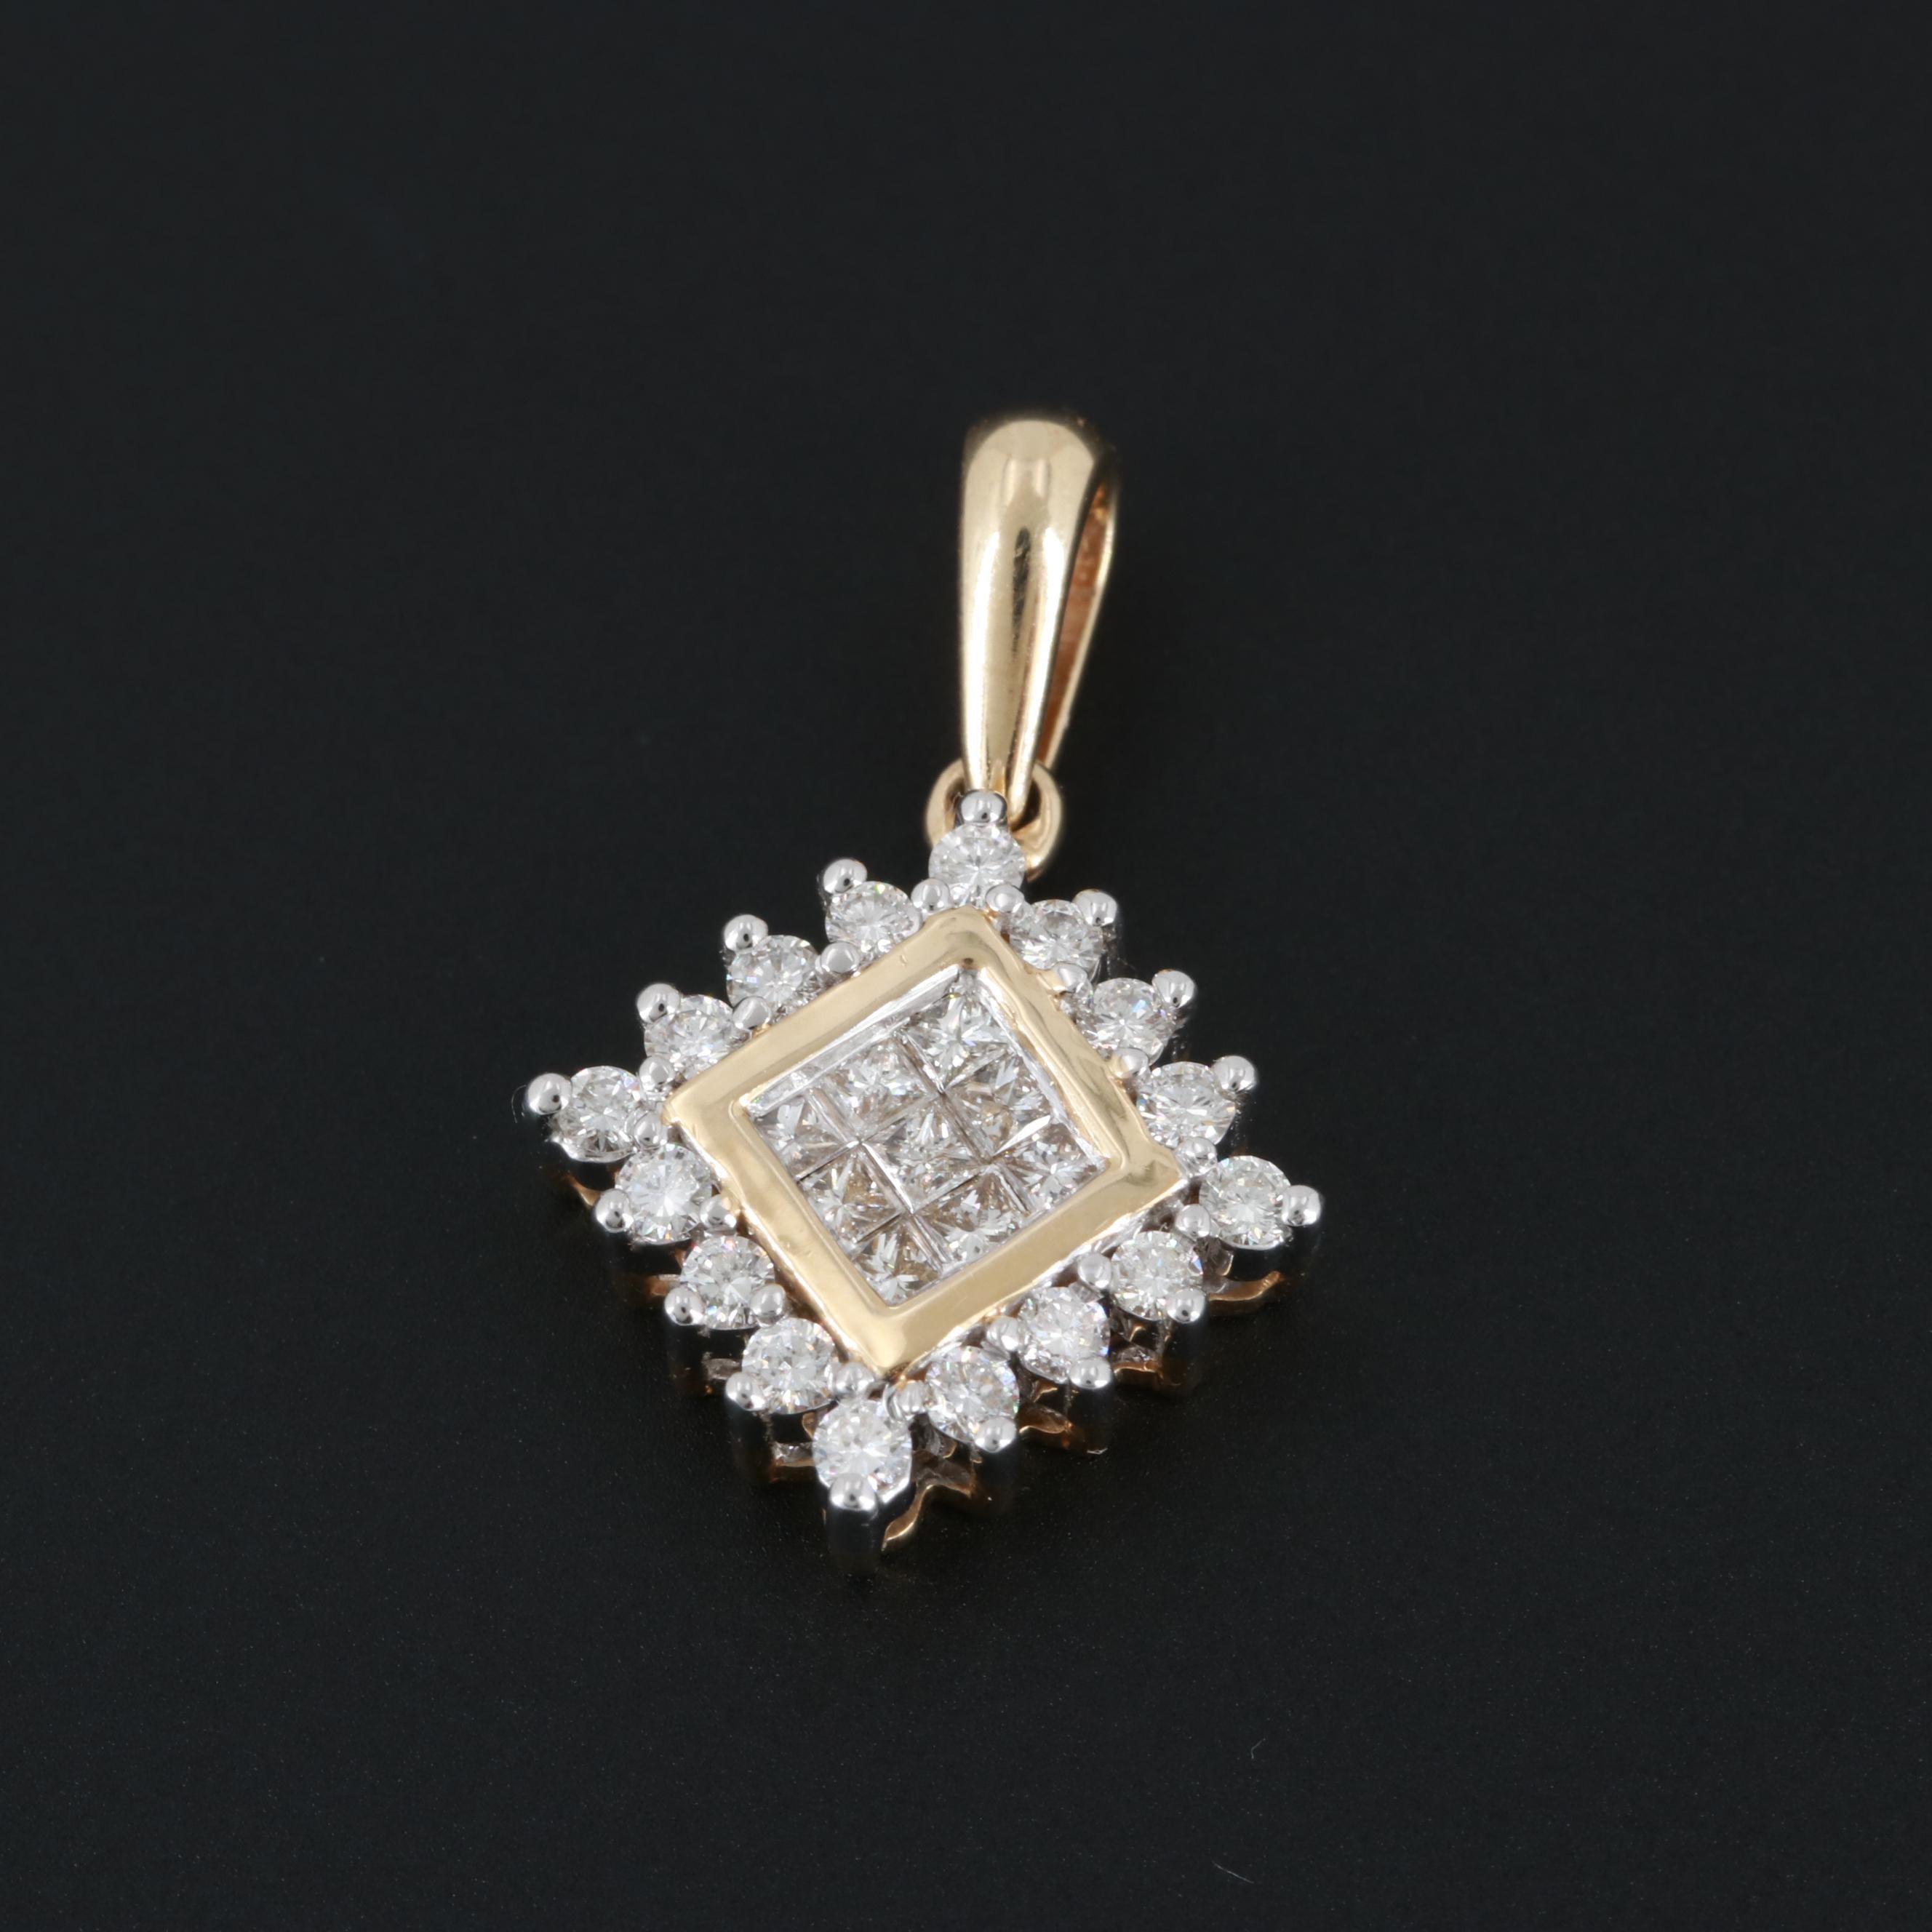 14K Yellow Gold Diamond Pendant